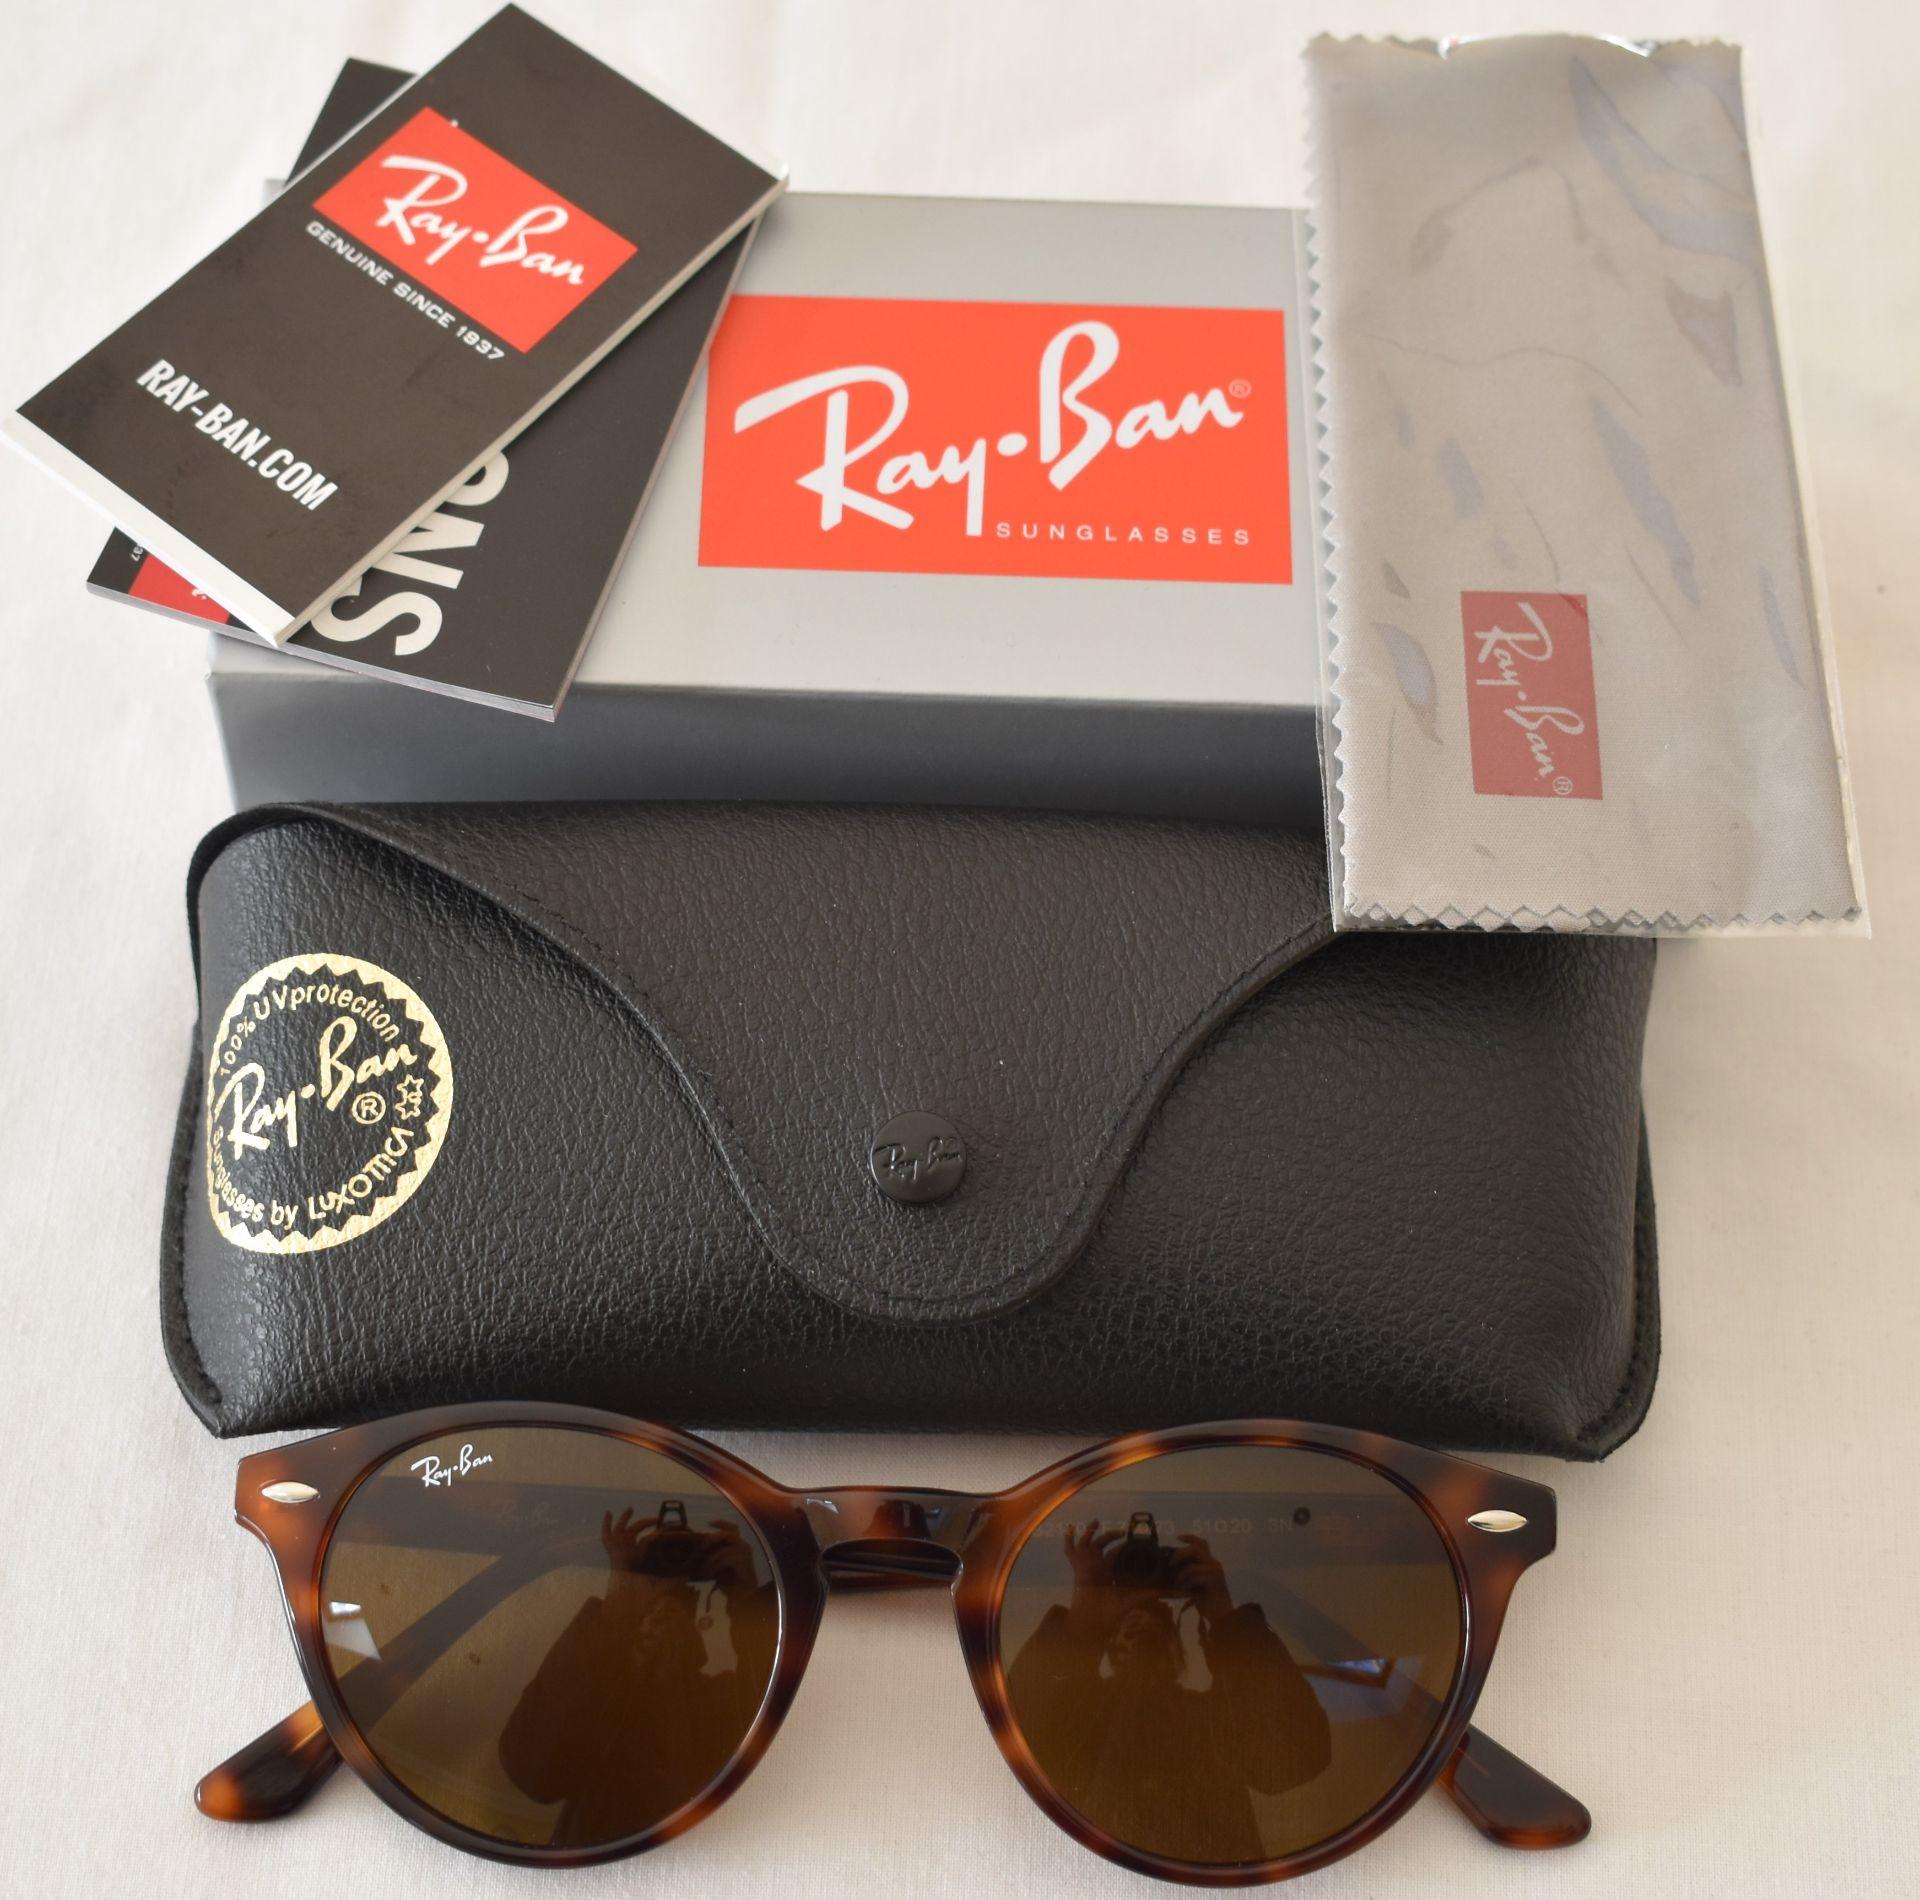 Ray Ban Sunglasses ORB2180F 710/73RB *3N - Image 2 of 3